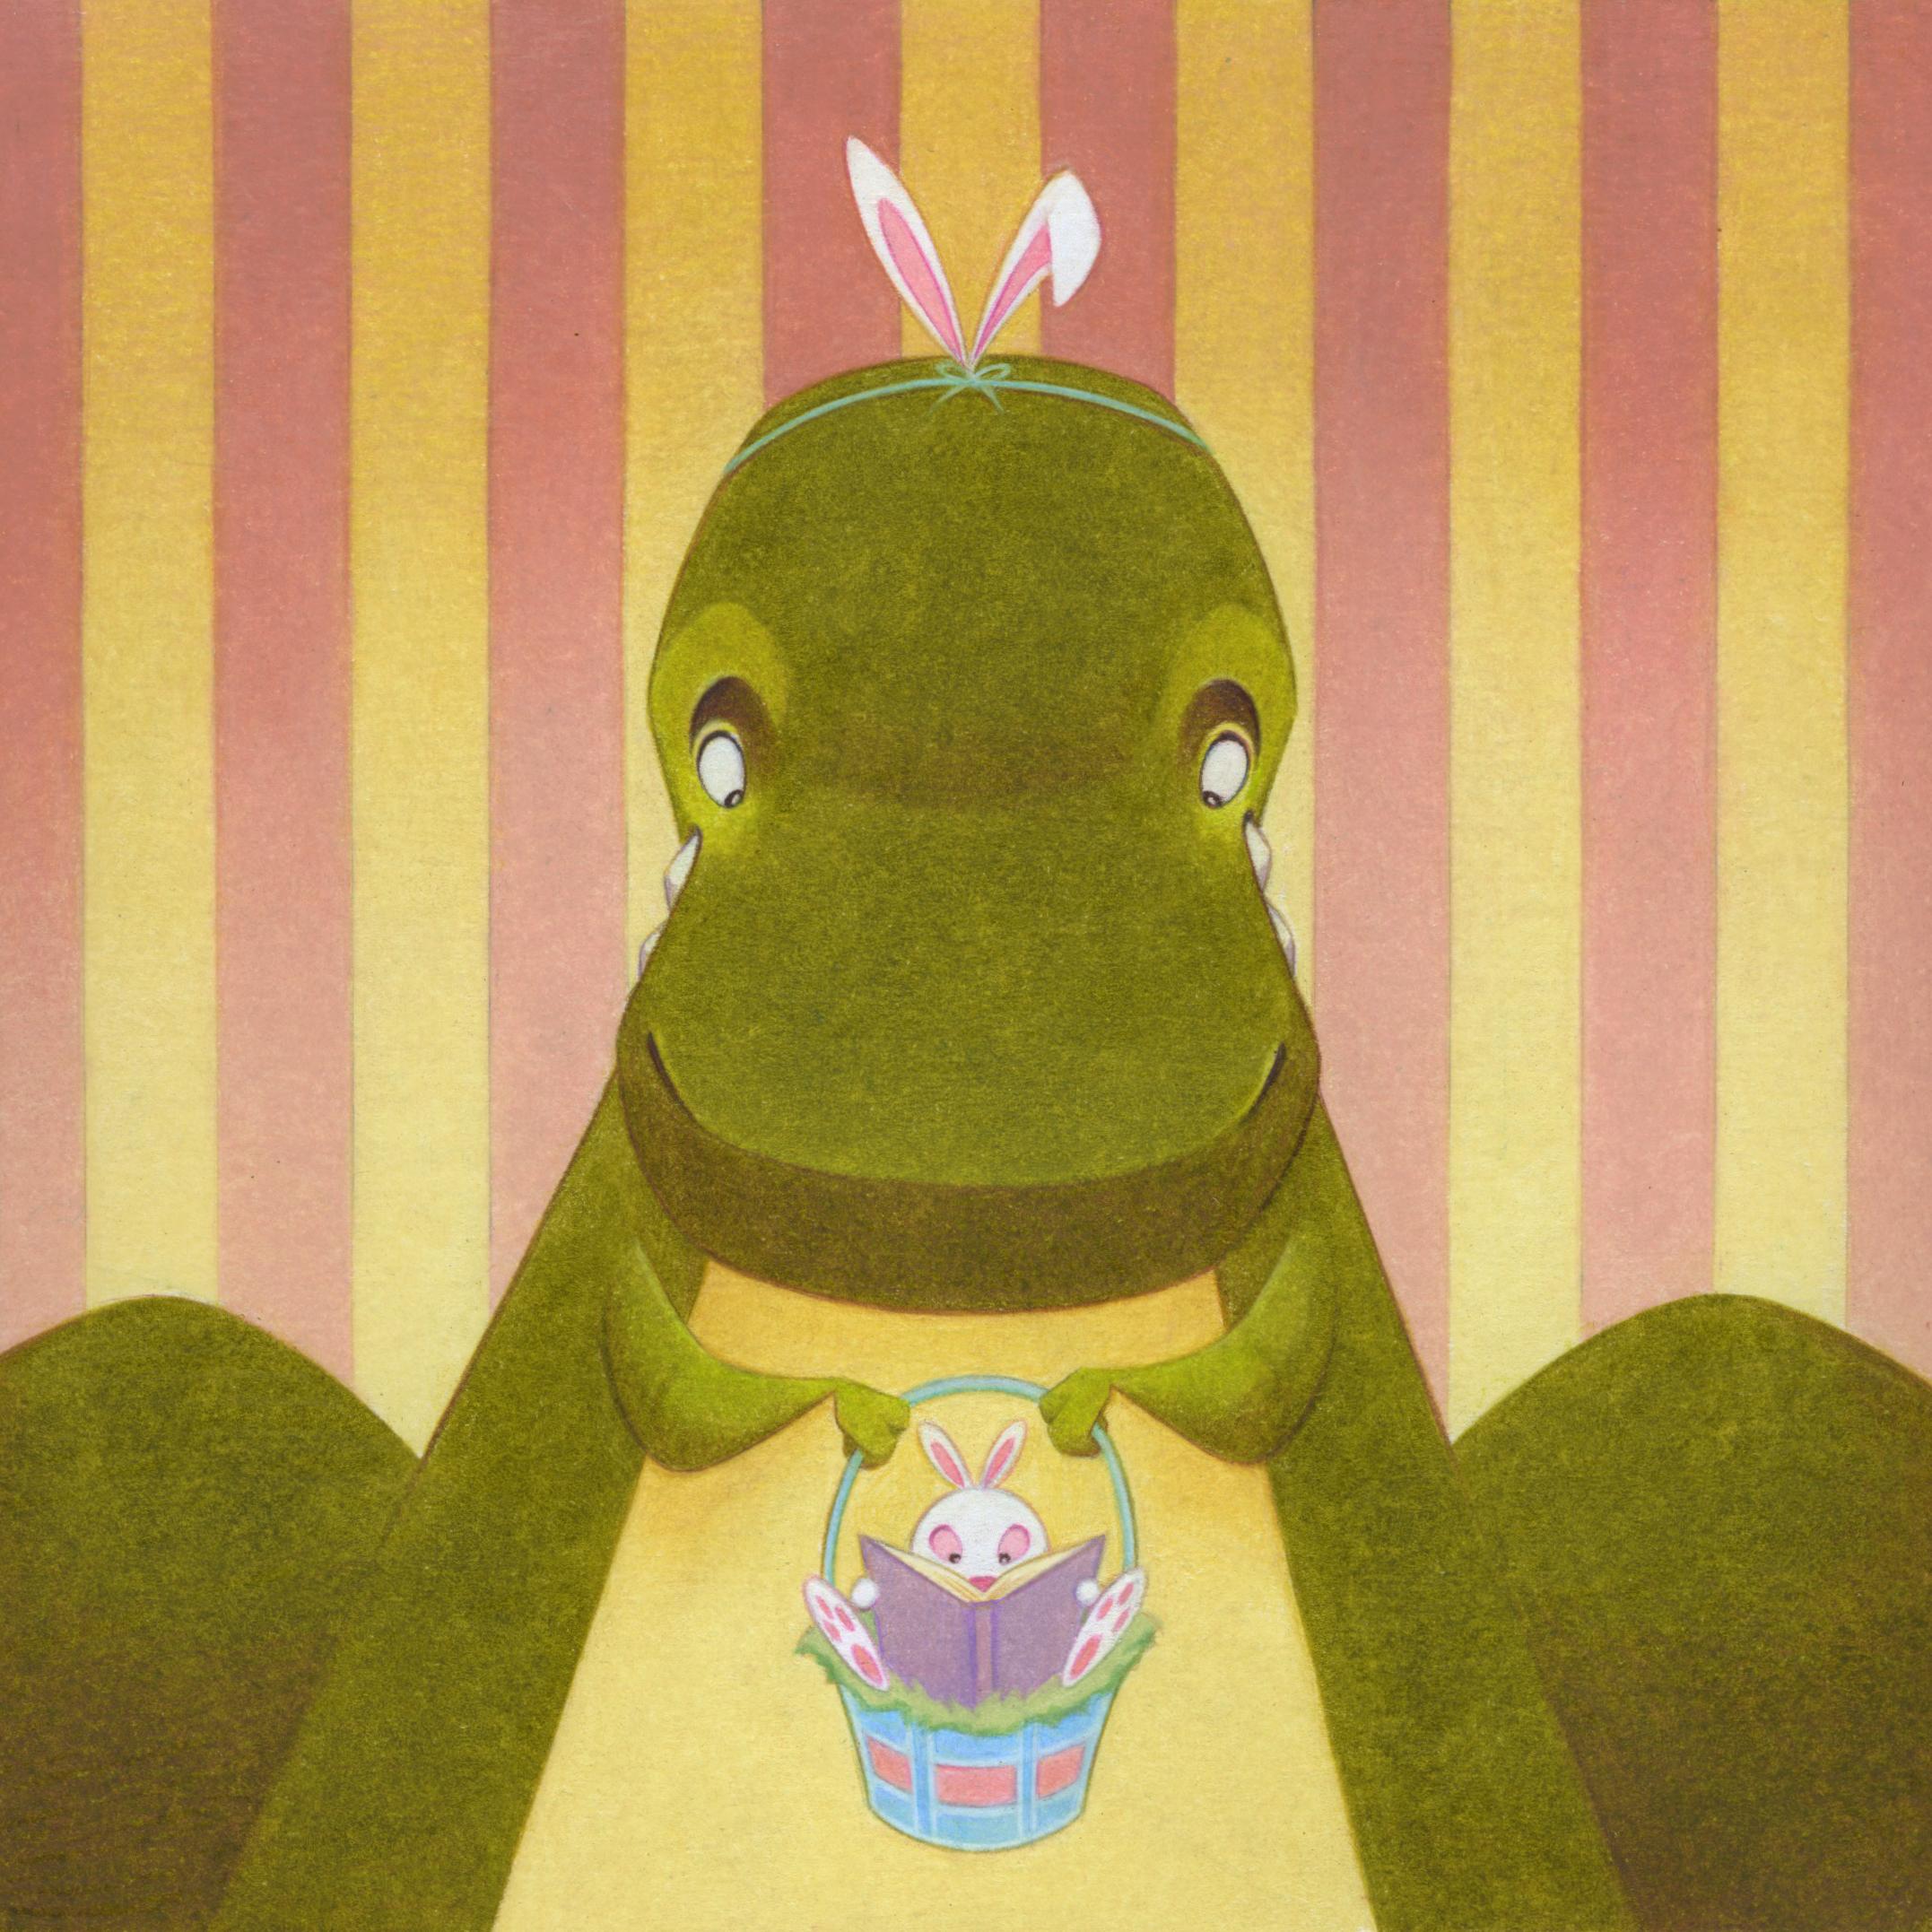 tea rex podcast bunny presents 7 matthewcwinner